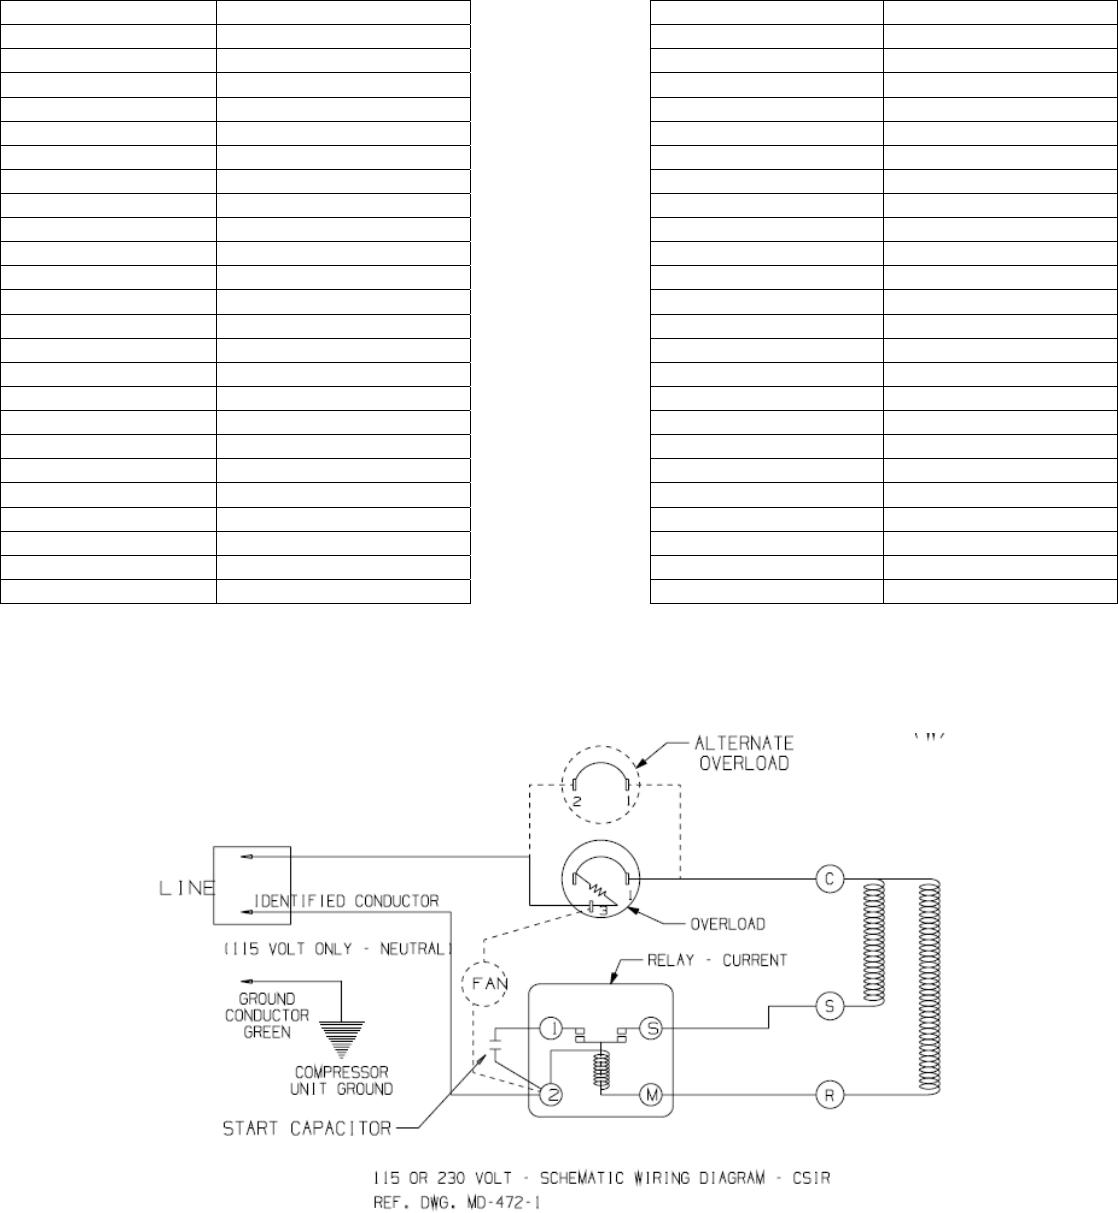 Berühmt Tecumseh Kompressor Schaltplan Zeitgenössisch - Elektrische ...